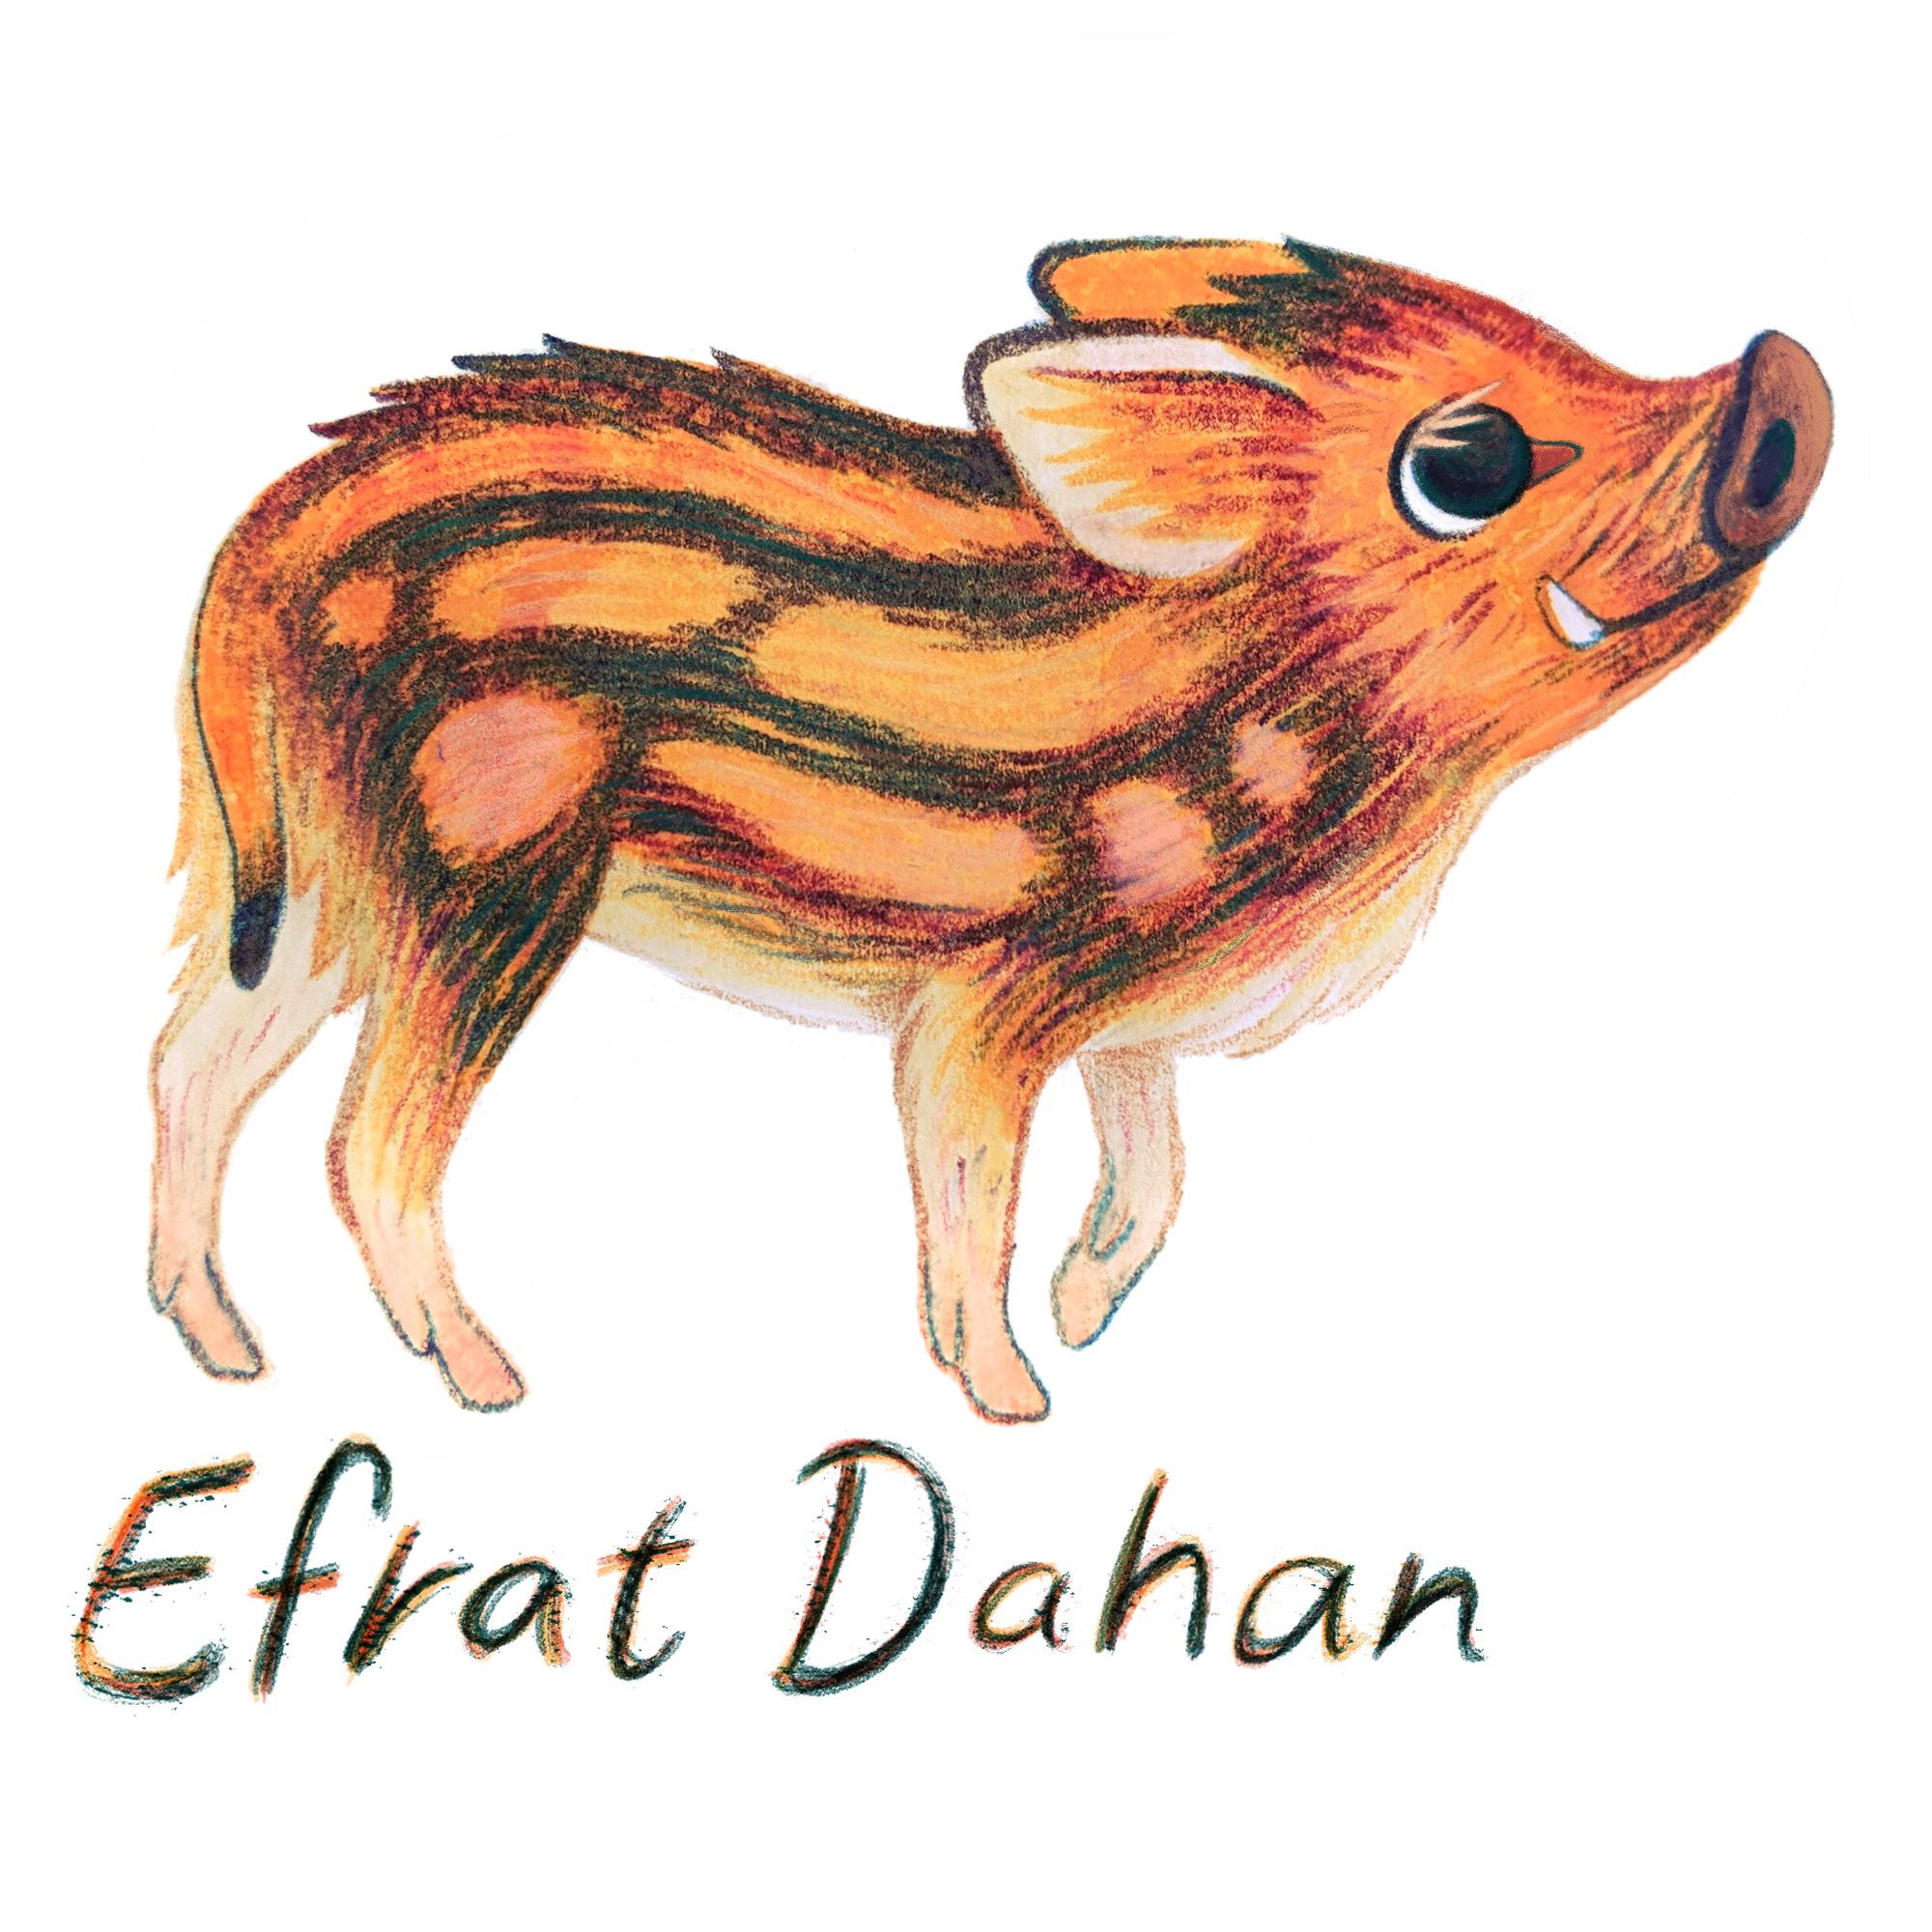 Efrat Dahan